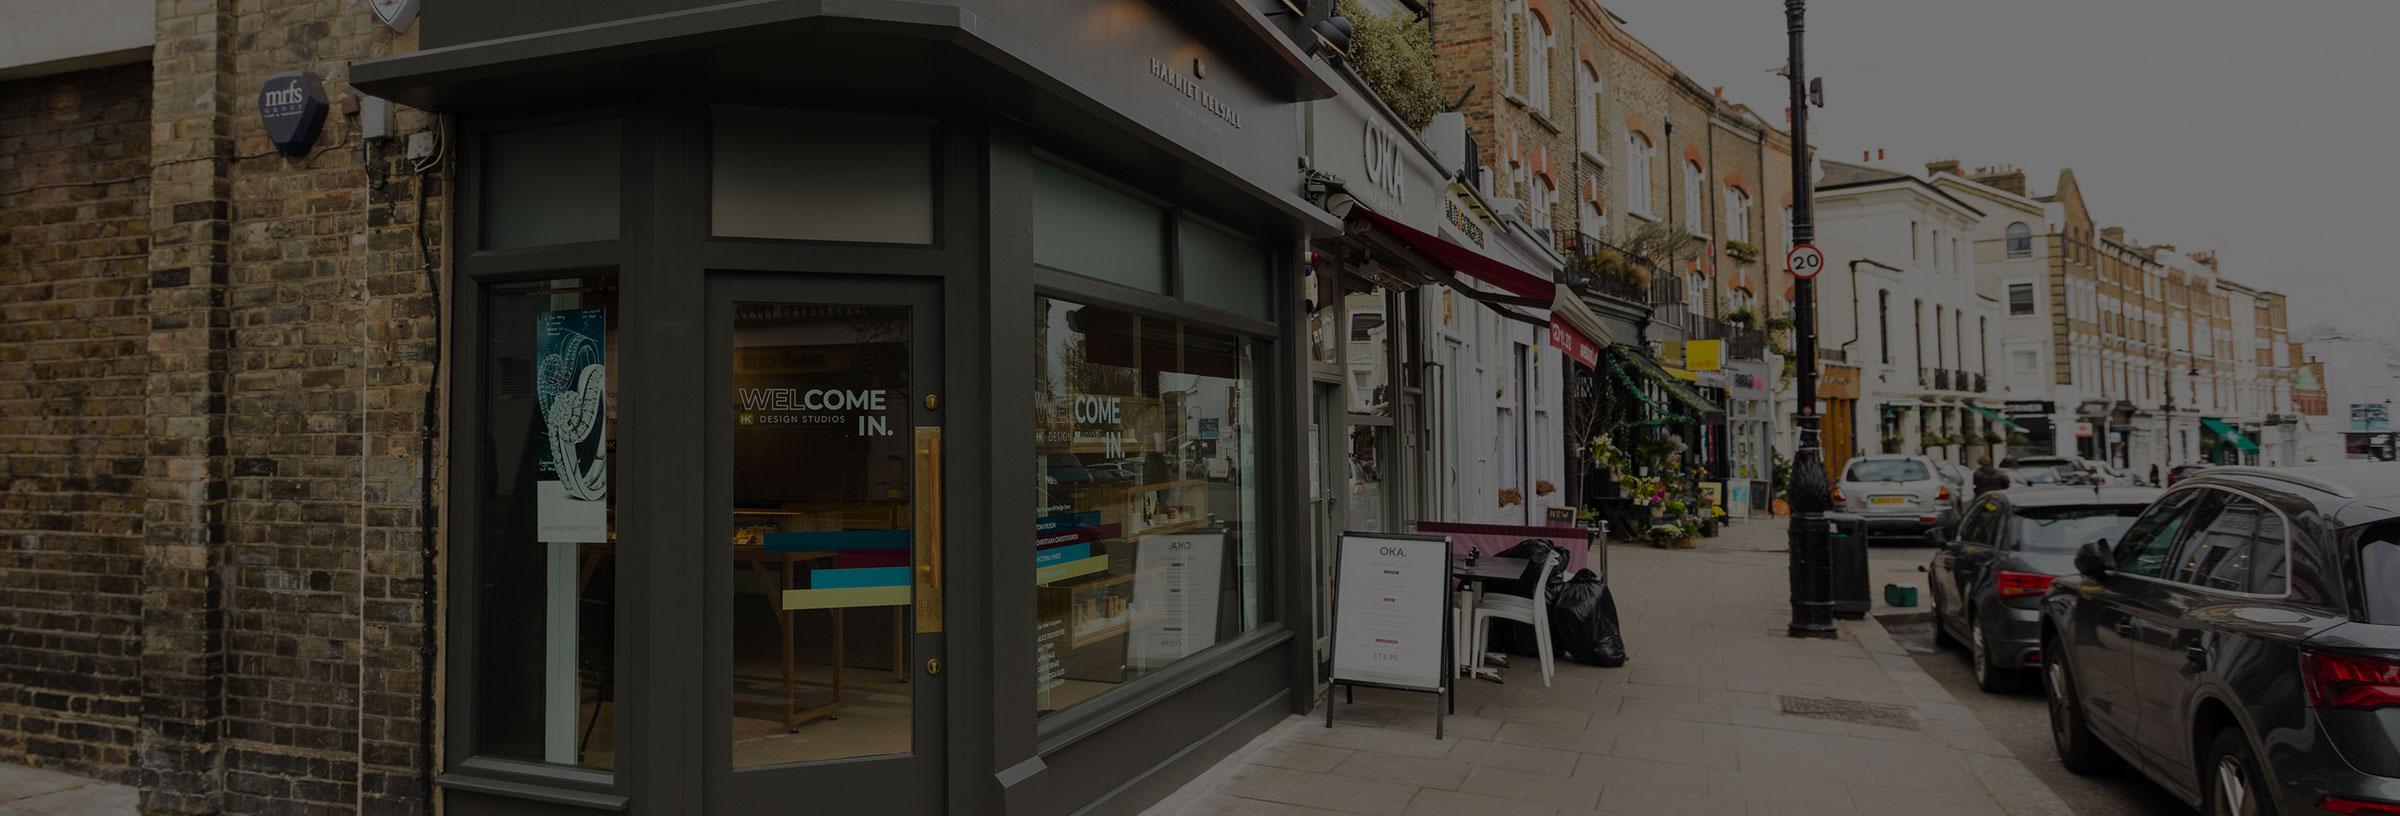 Photos of the London Studio